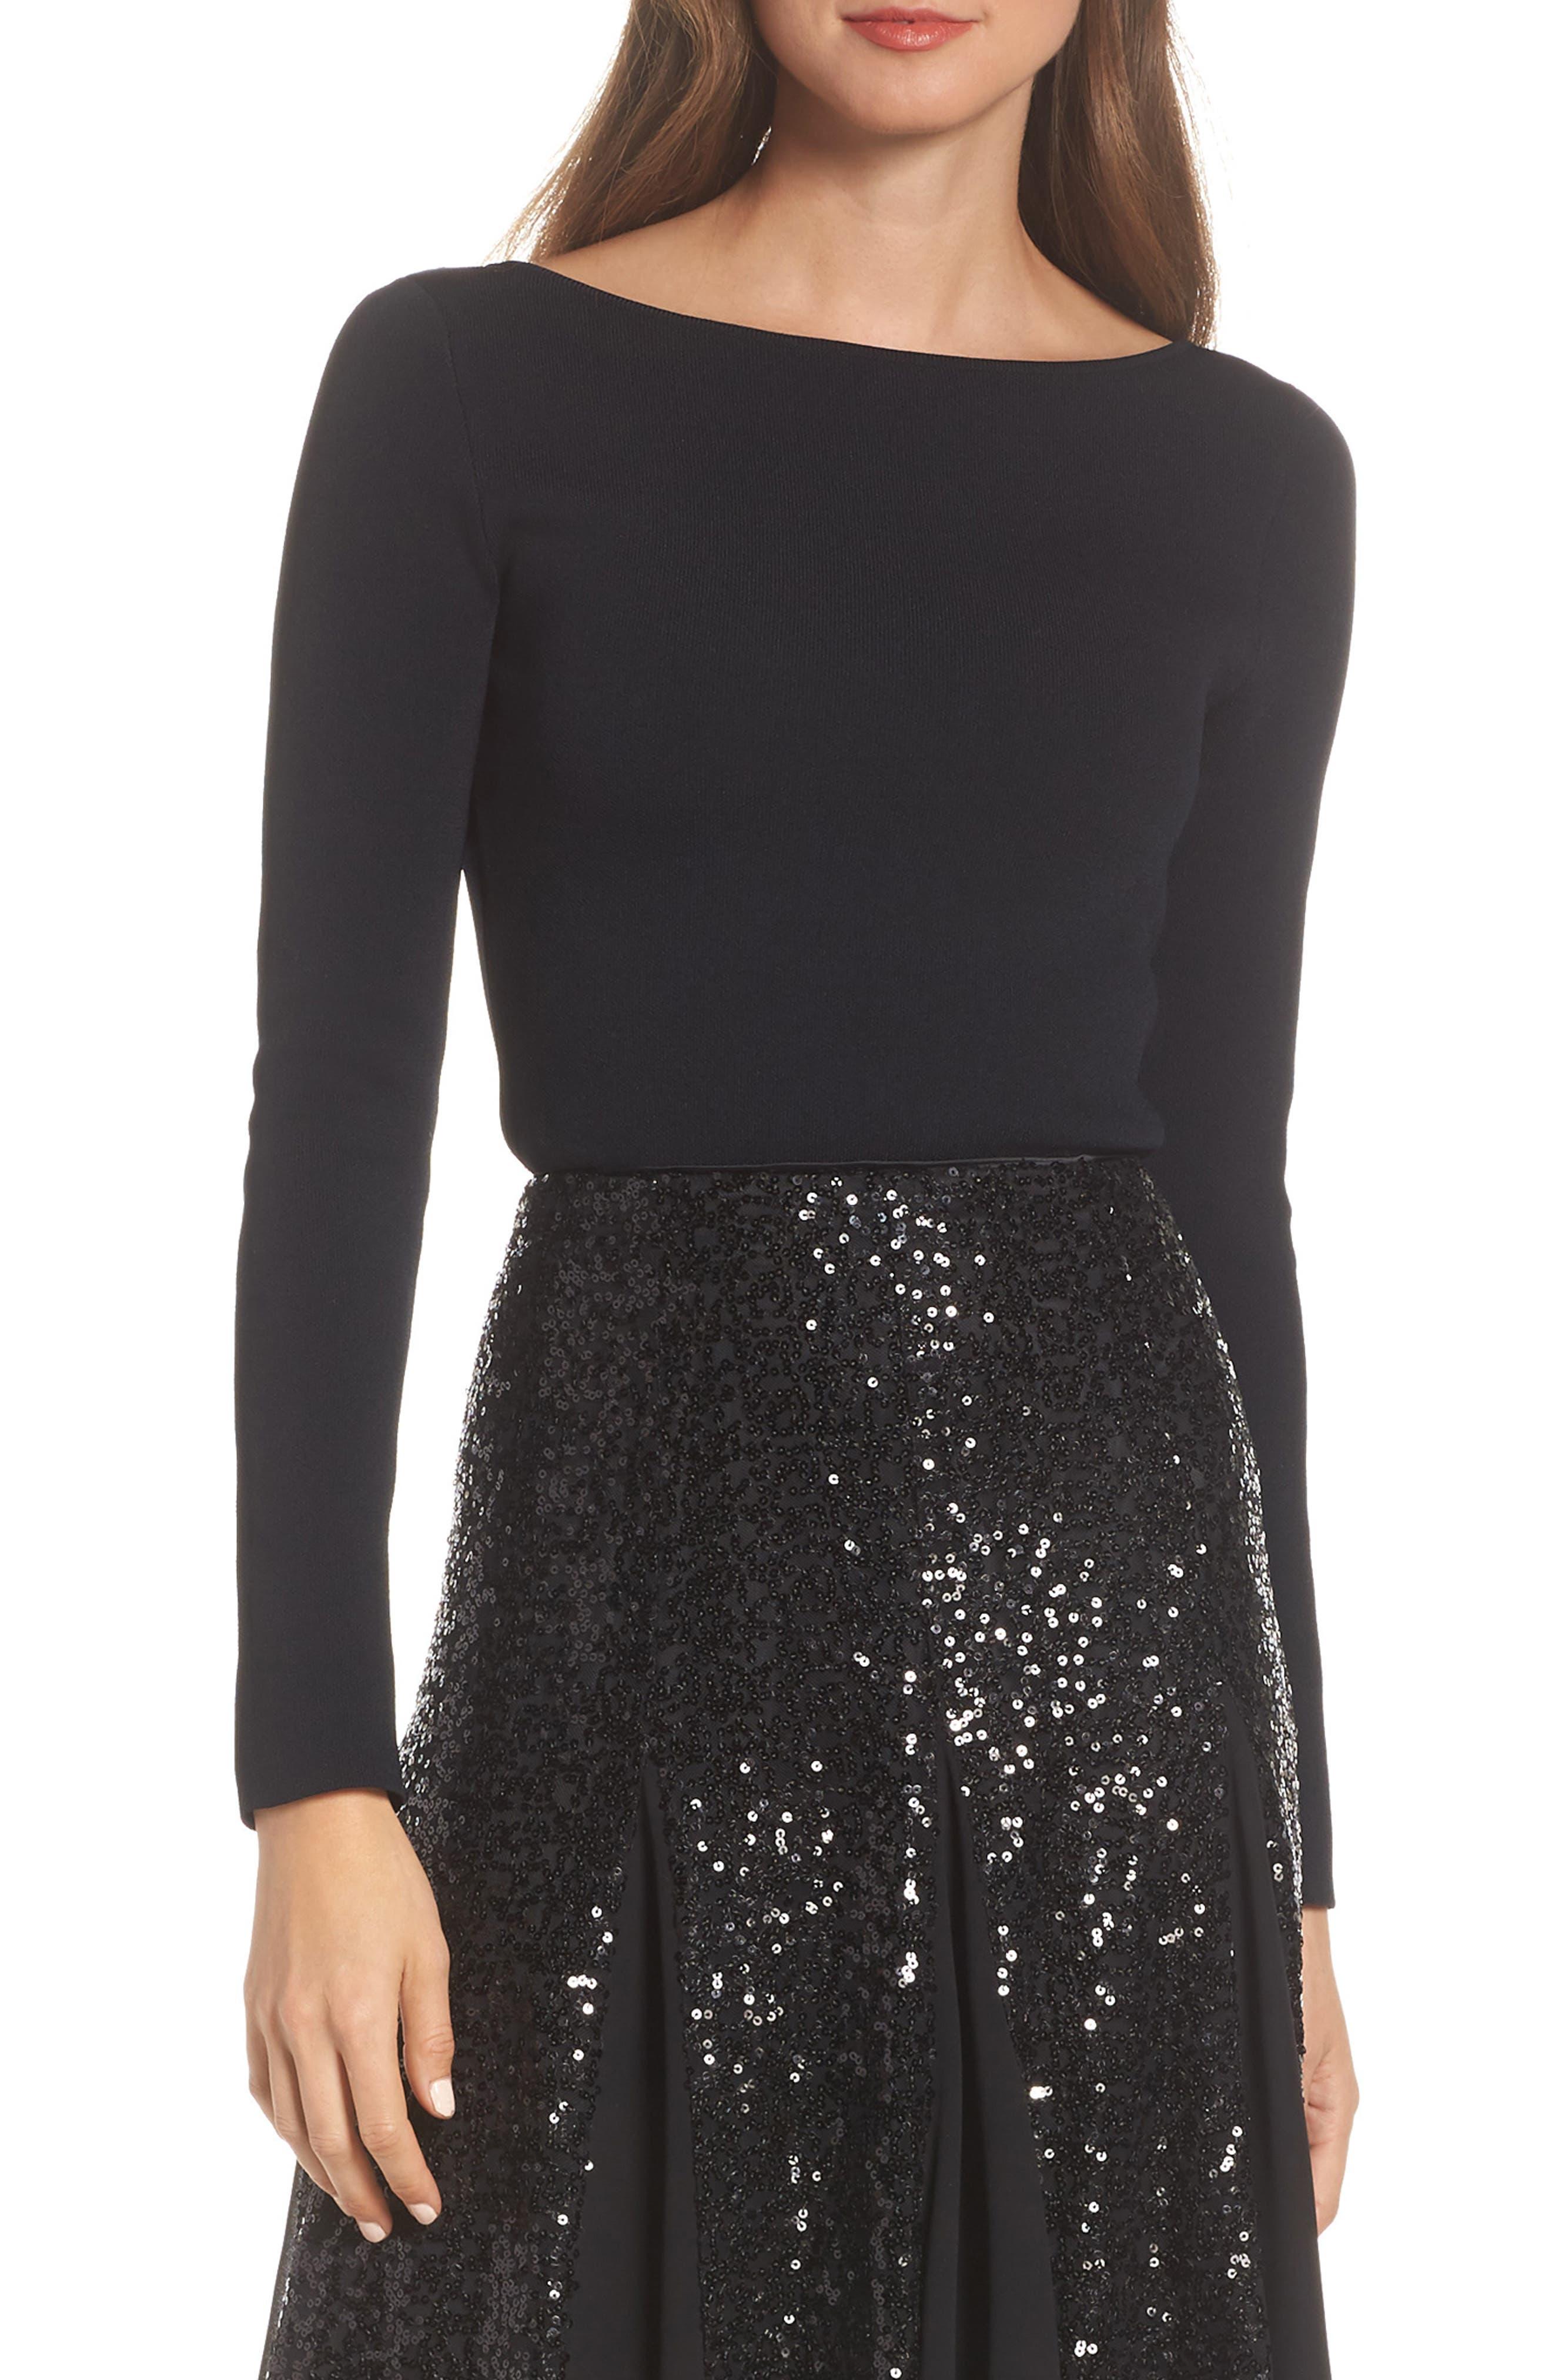 Eliza J Bow Back Sweater, Black